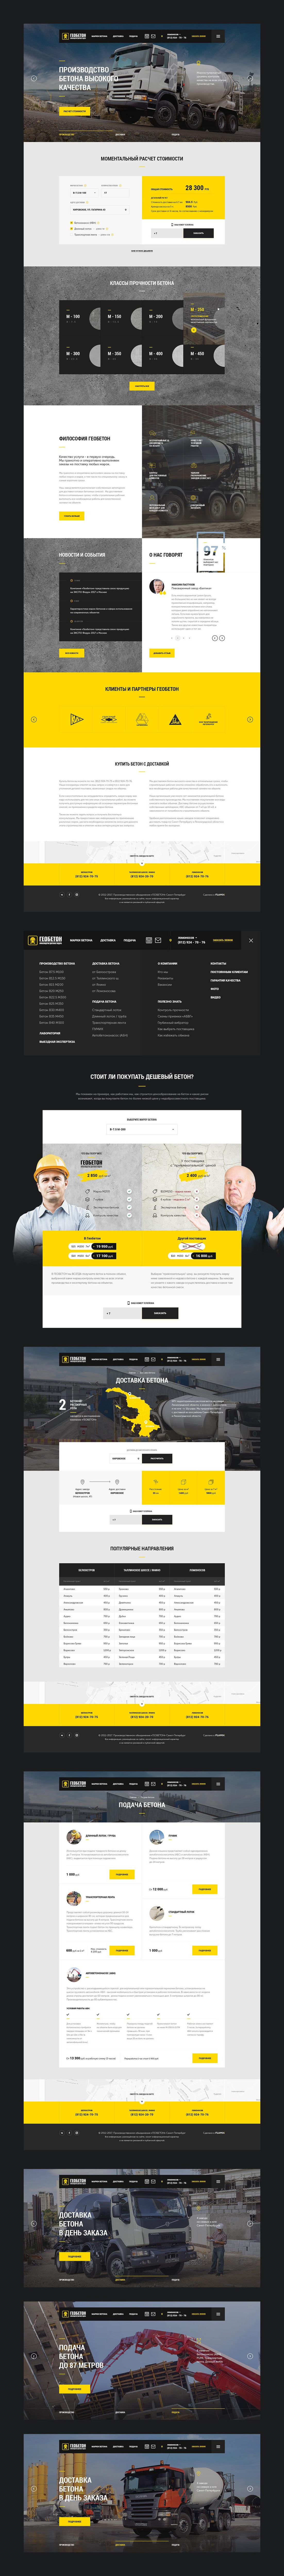 Корпоративный сайт компании Geobeton